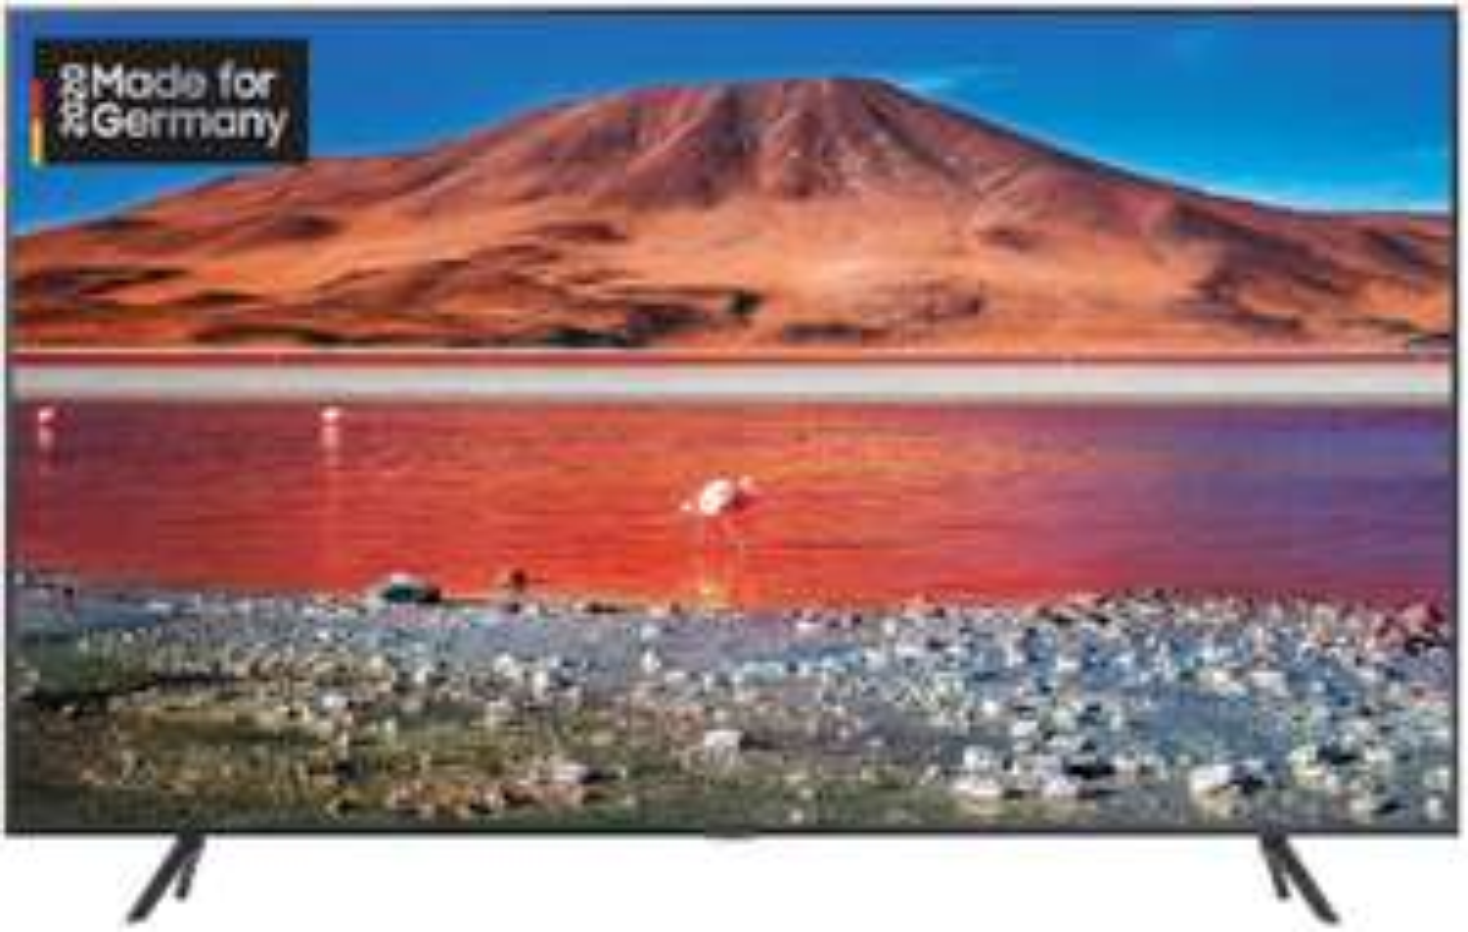 Samsung TU7199 108 cm (43 Zoll) LED Fernseher (Ultra HD, HDR 10+, Triple Tuner, Smart TV) [Modelljahr 2020] [Amazon]